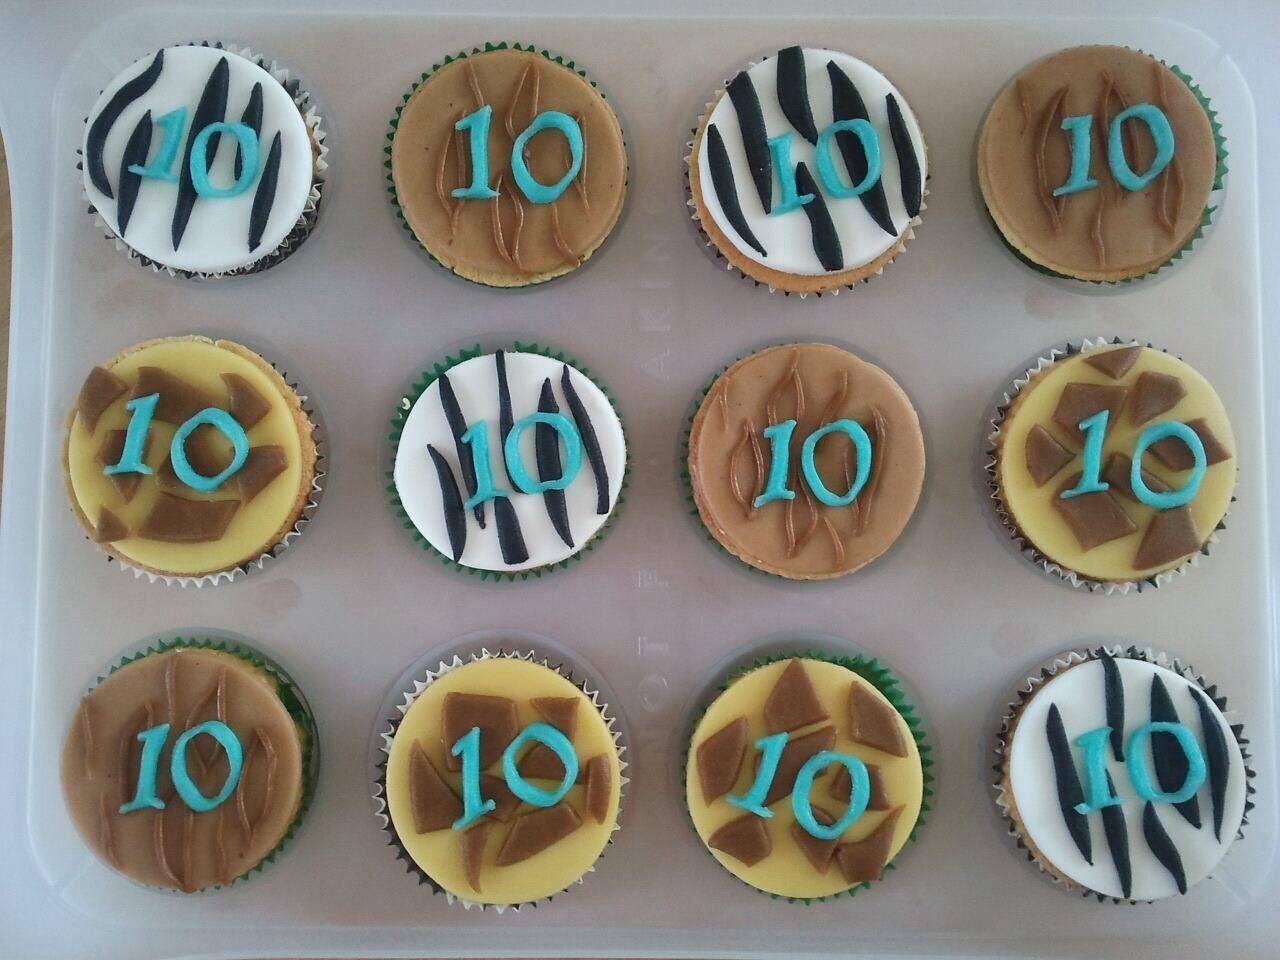 Dierenprint cupcakes